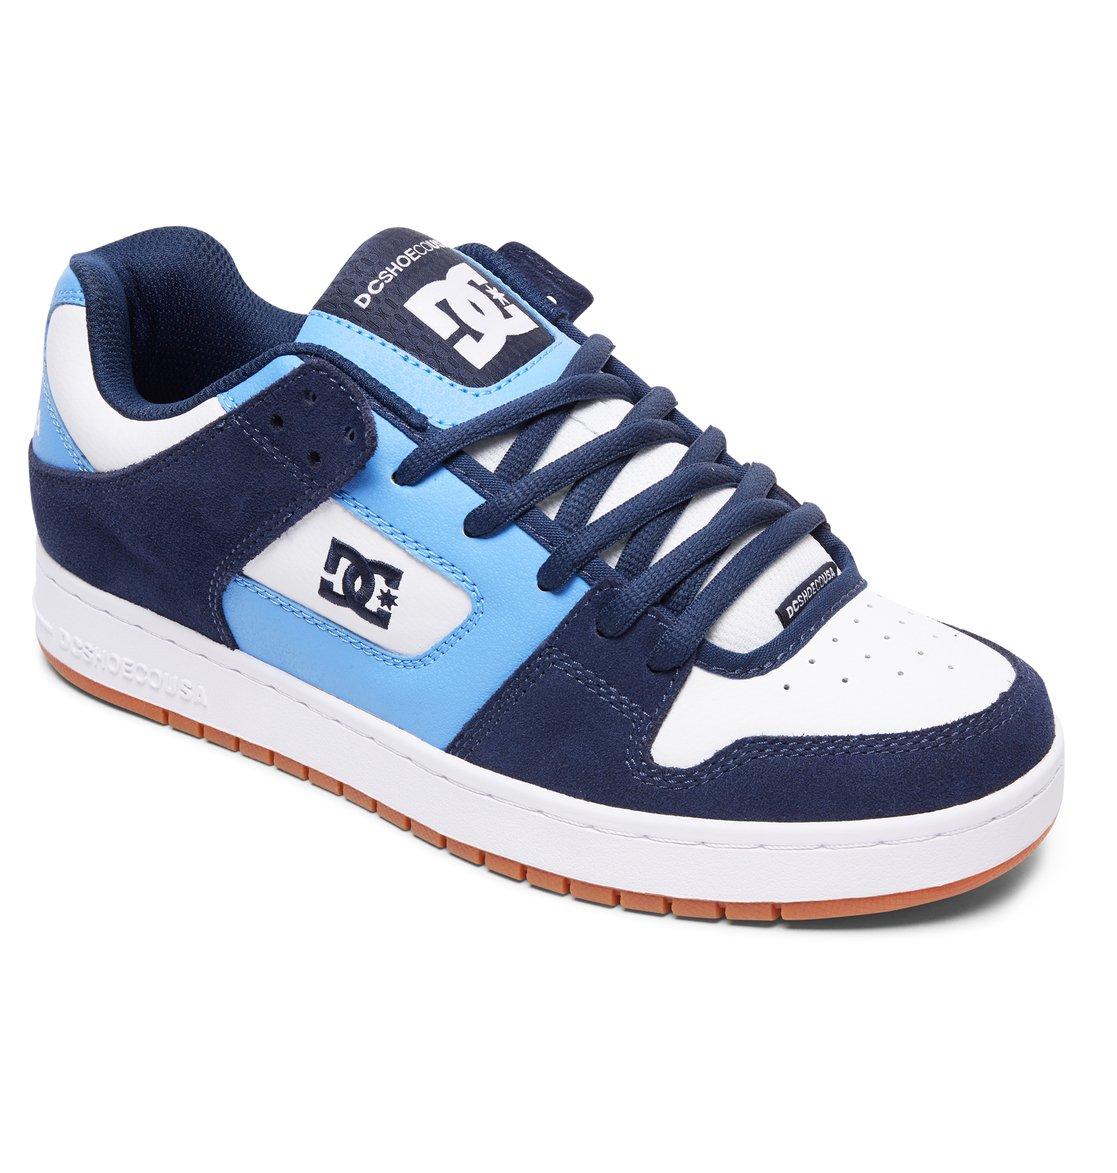 1 ADYS100177 DC Azul para Shoes Hombre Zapatos Manteca DYEI9H2W